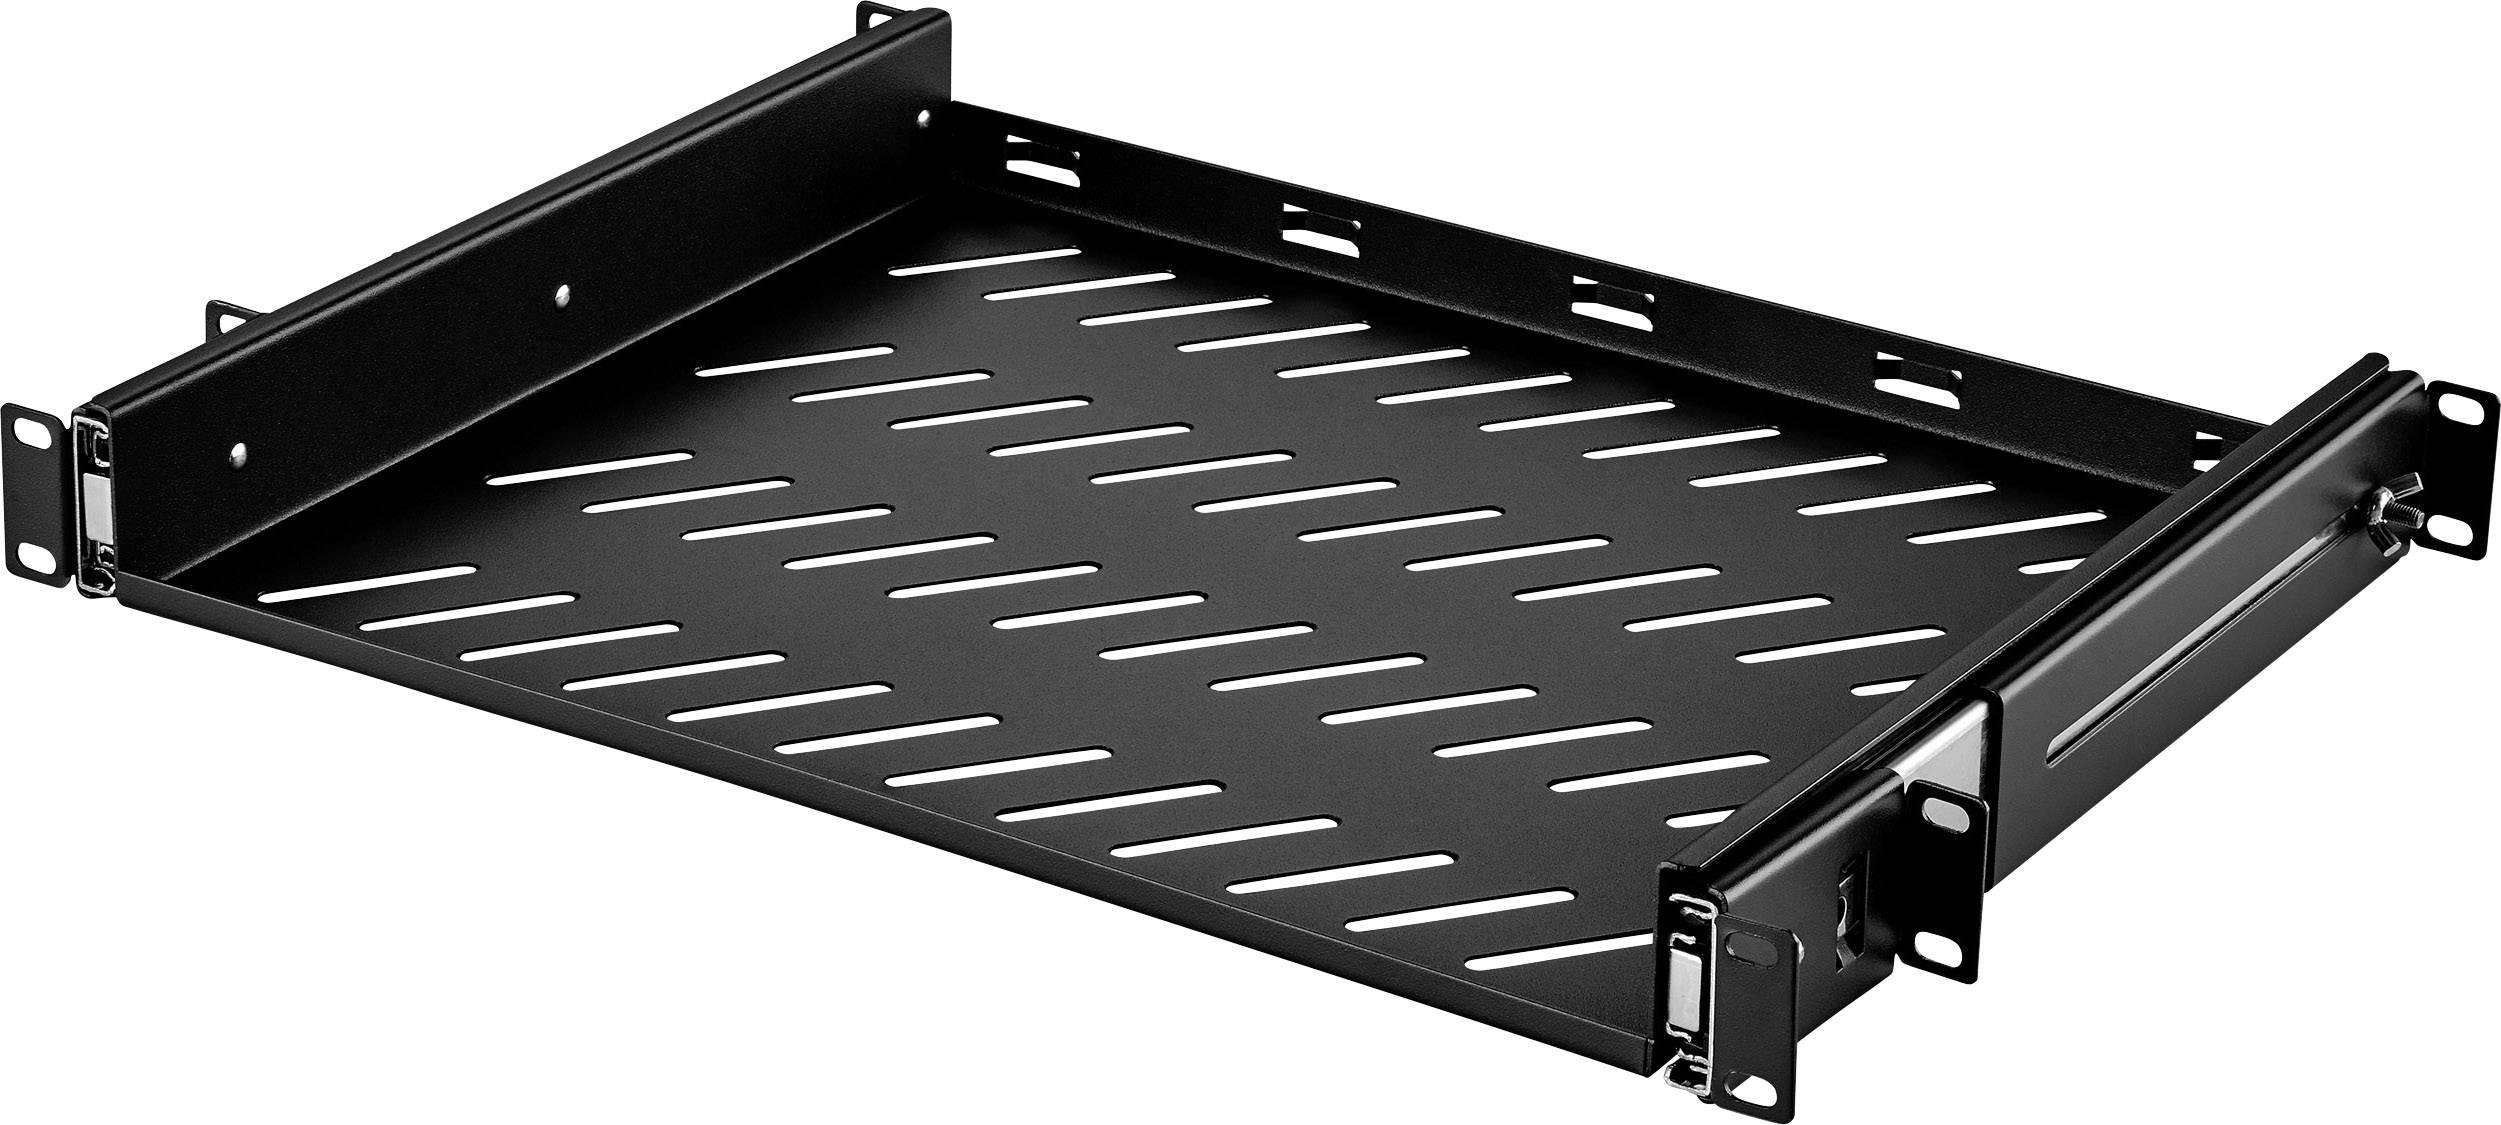 Black Rack Shelf 508 mm Steel 19 Inch 17.5 20 RASU190720BK1 Unvented RASU190720BK1 Cabinet Racks 4U 445 mm